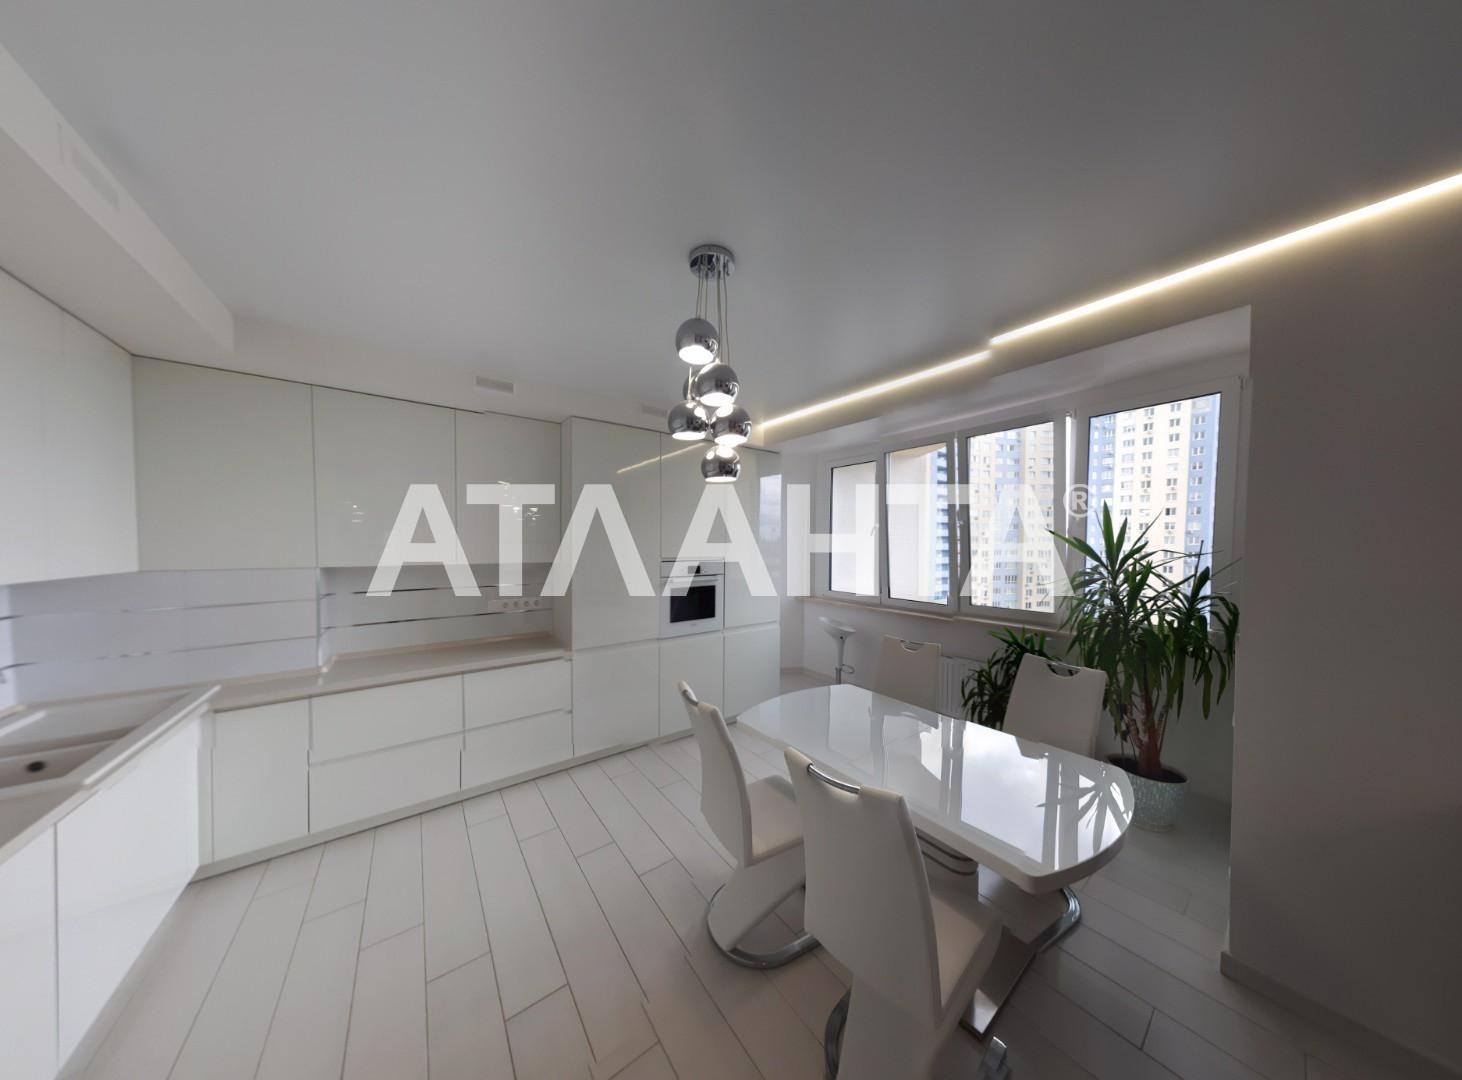 Продается 3-комнатная Квартира на ул. Просп. Глушкова — 160 000 у.е. (фото №13)